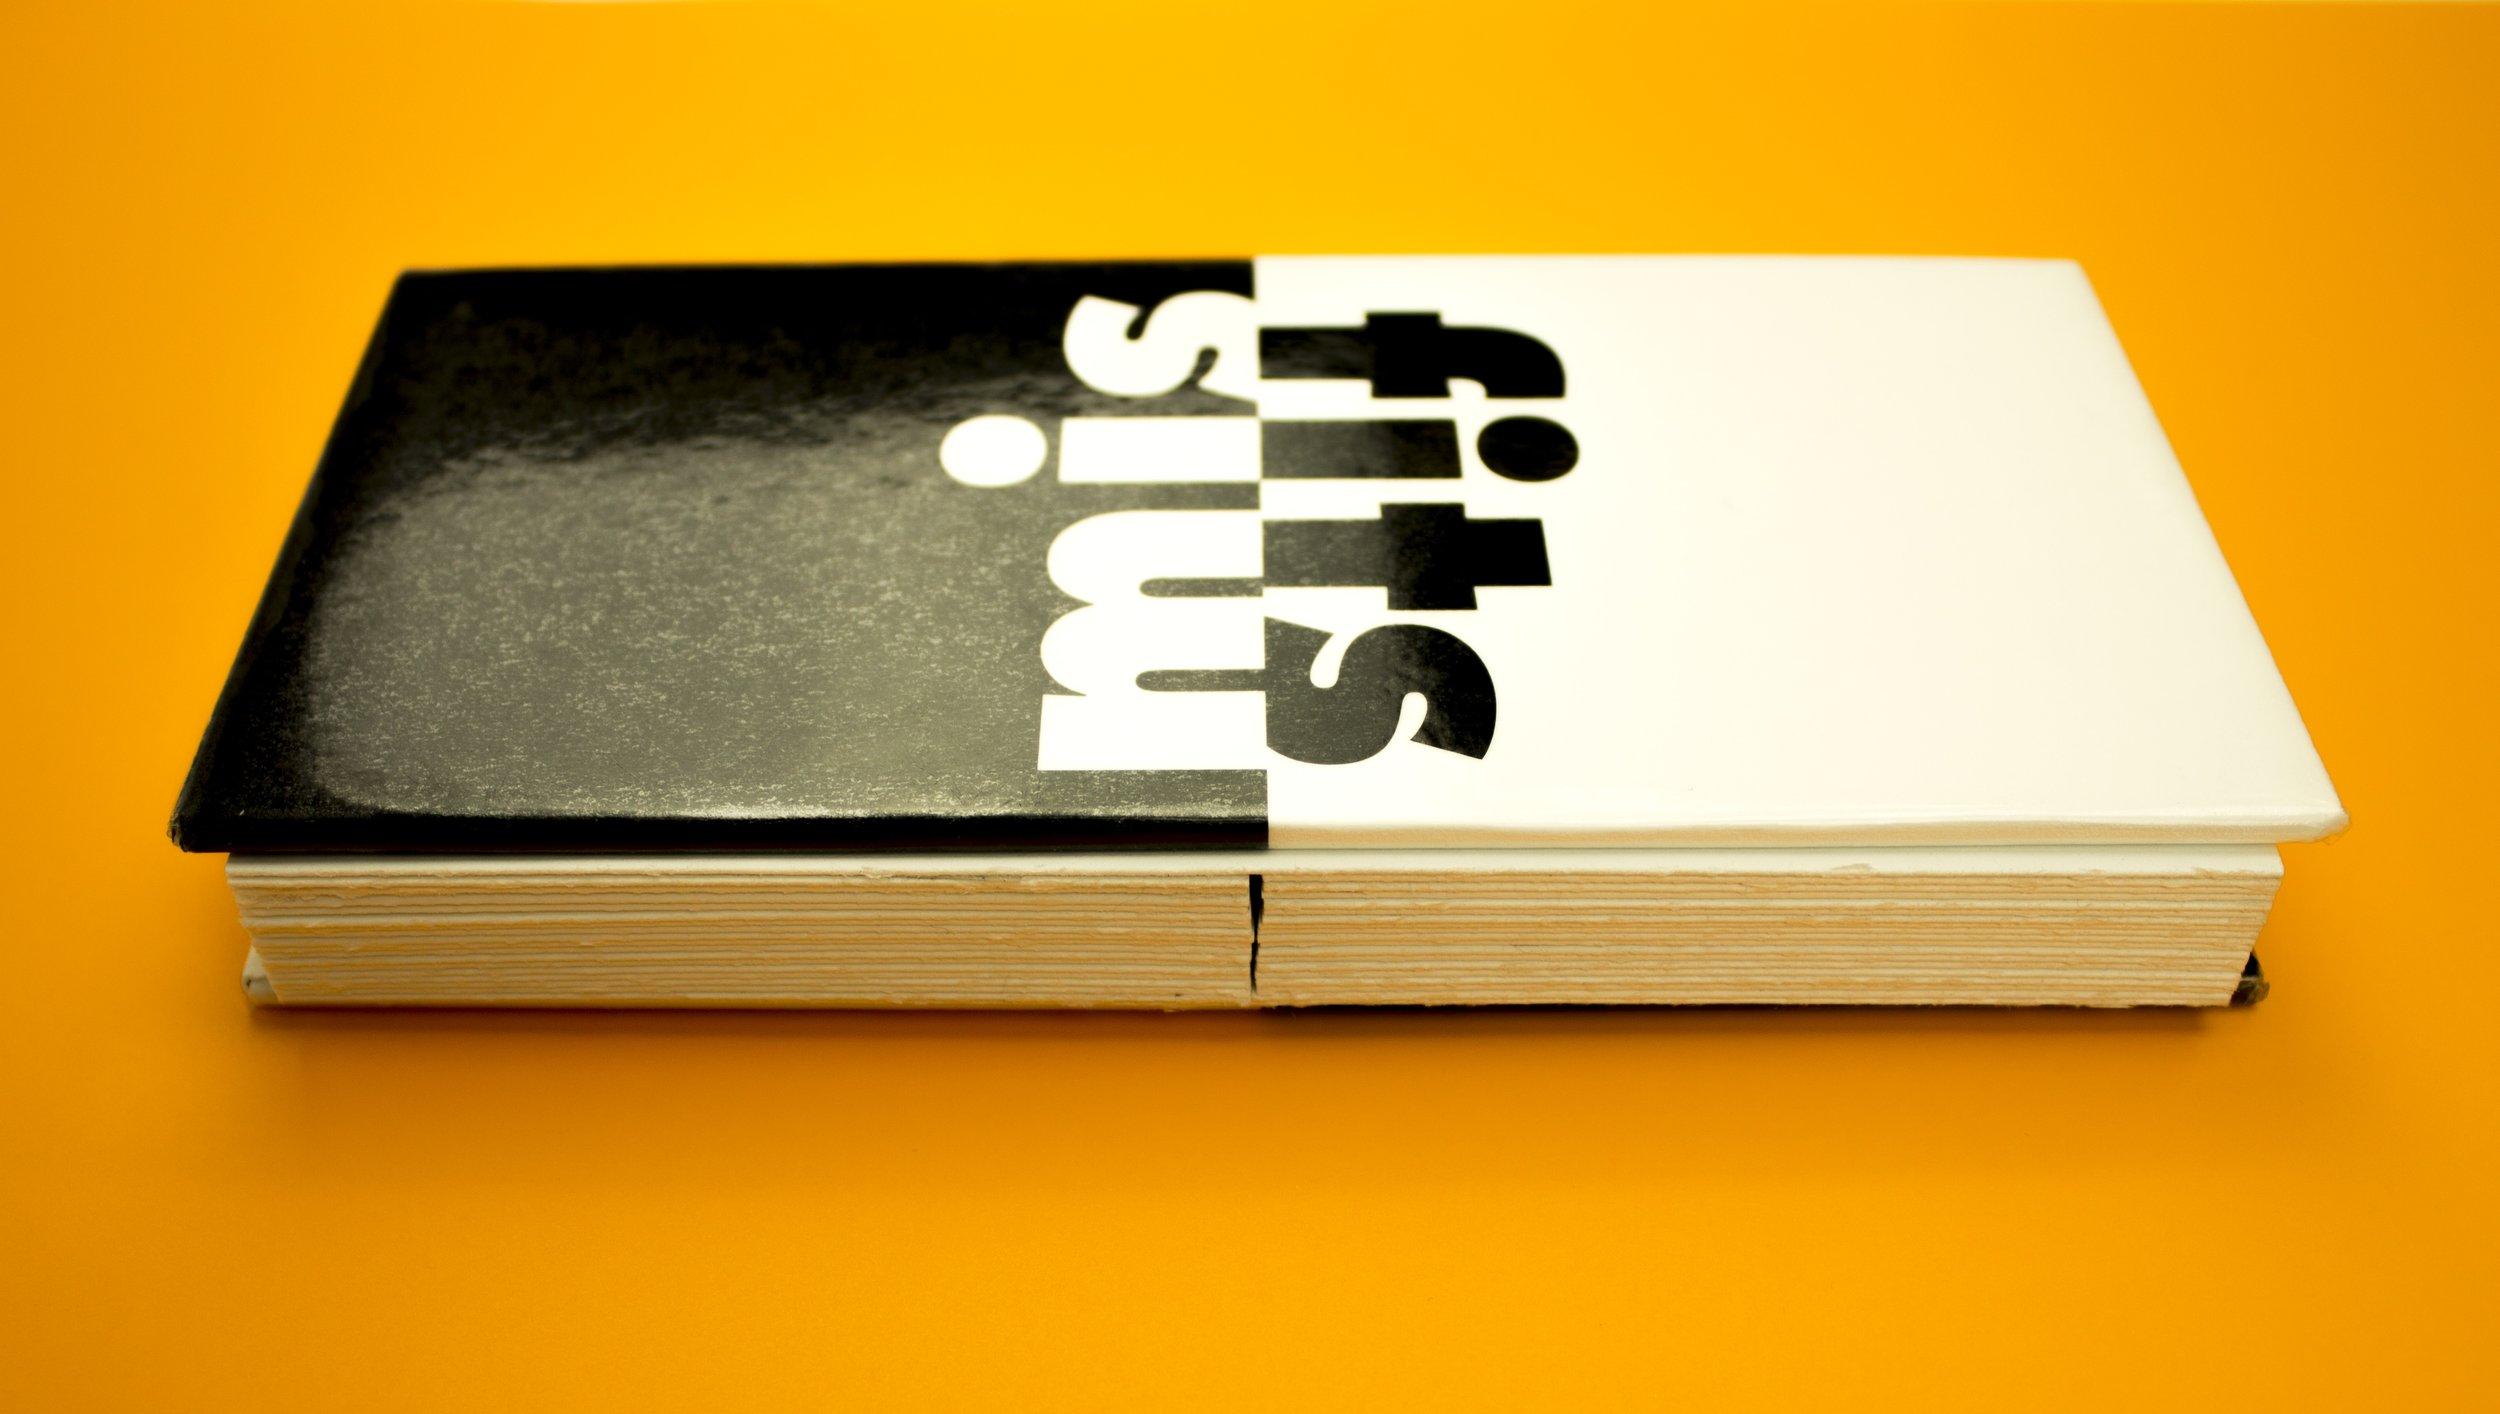 misfits side1.jpg